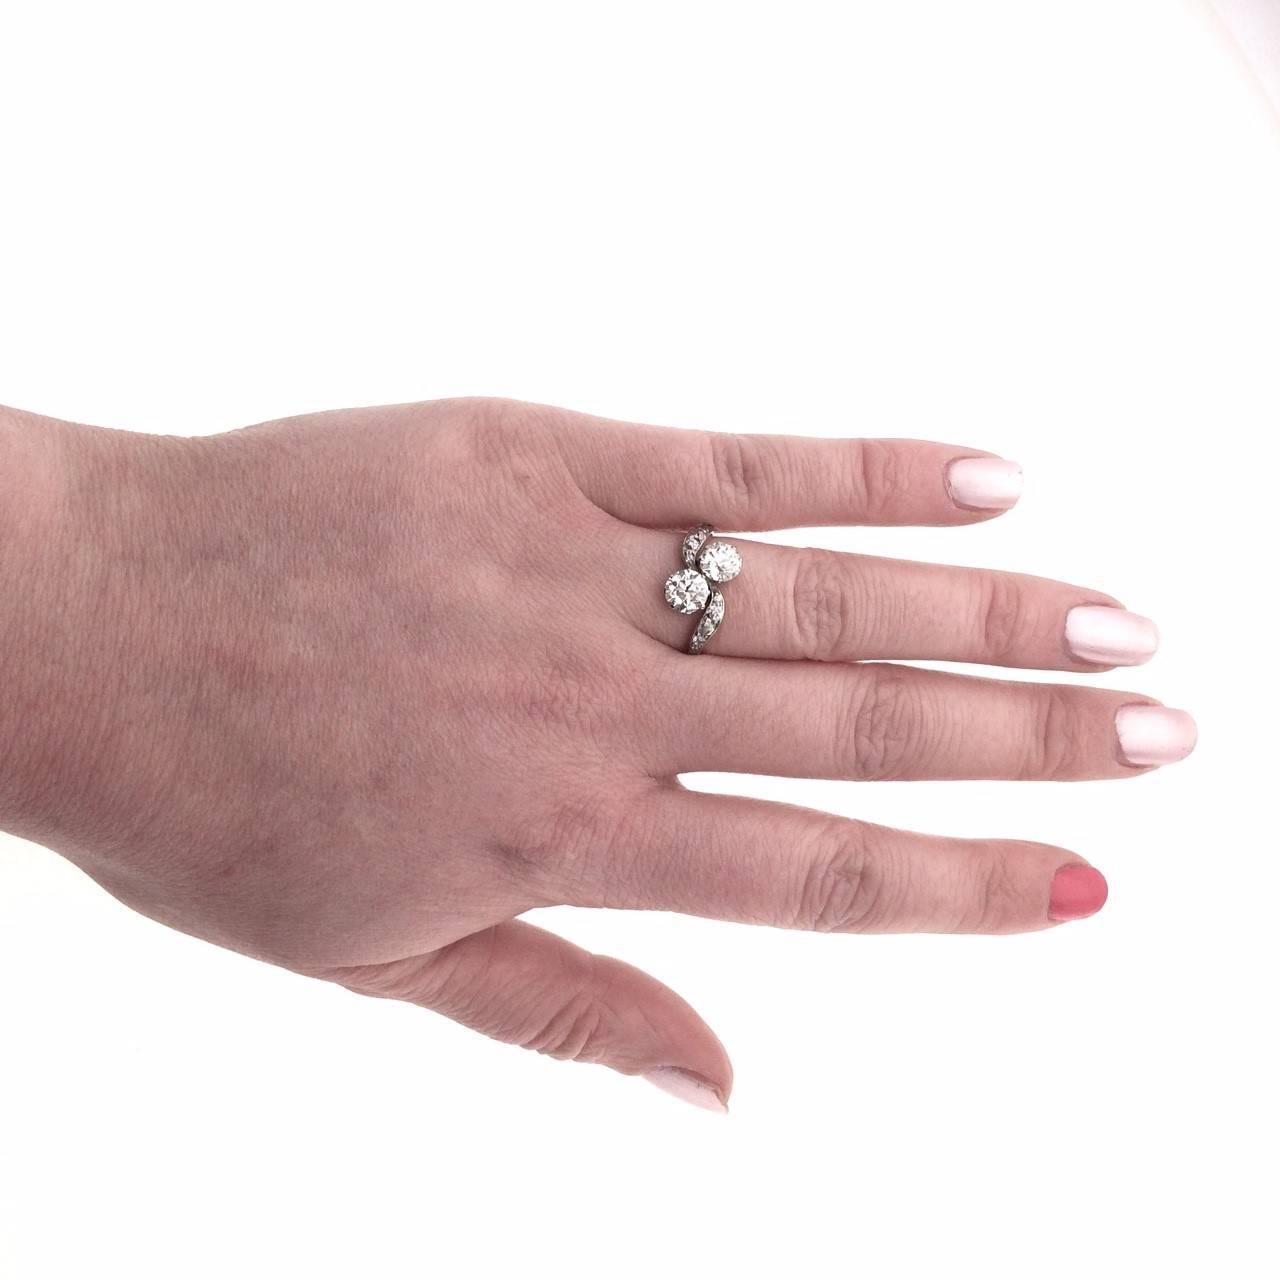 Edwardian Two-Stone Twist Diamond Engagement Ring at 1stdibs